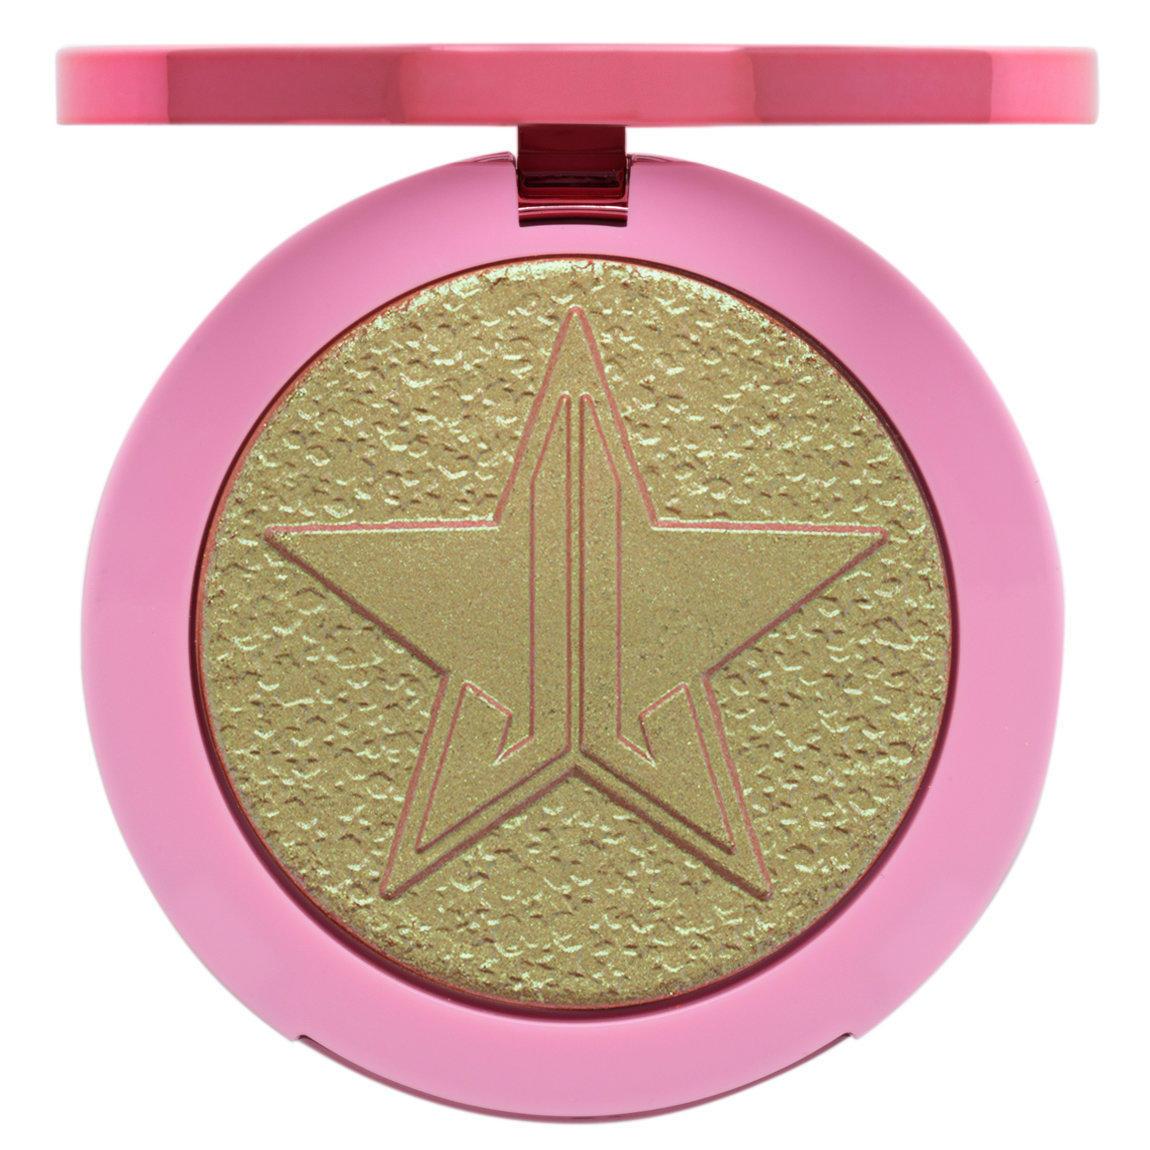 Jeffree Star Cosmetics Supreme Frost Highlighter Money Honey